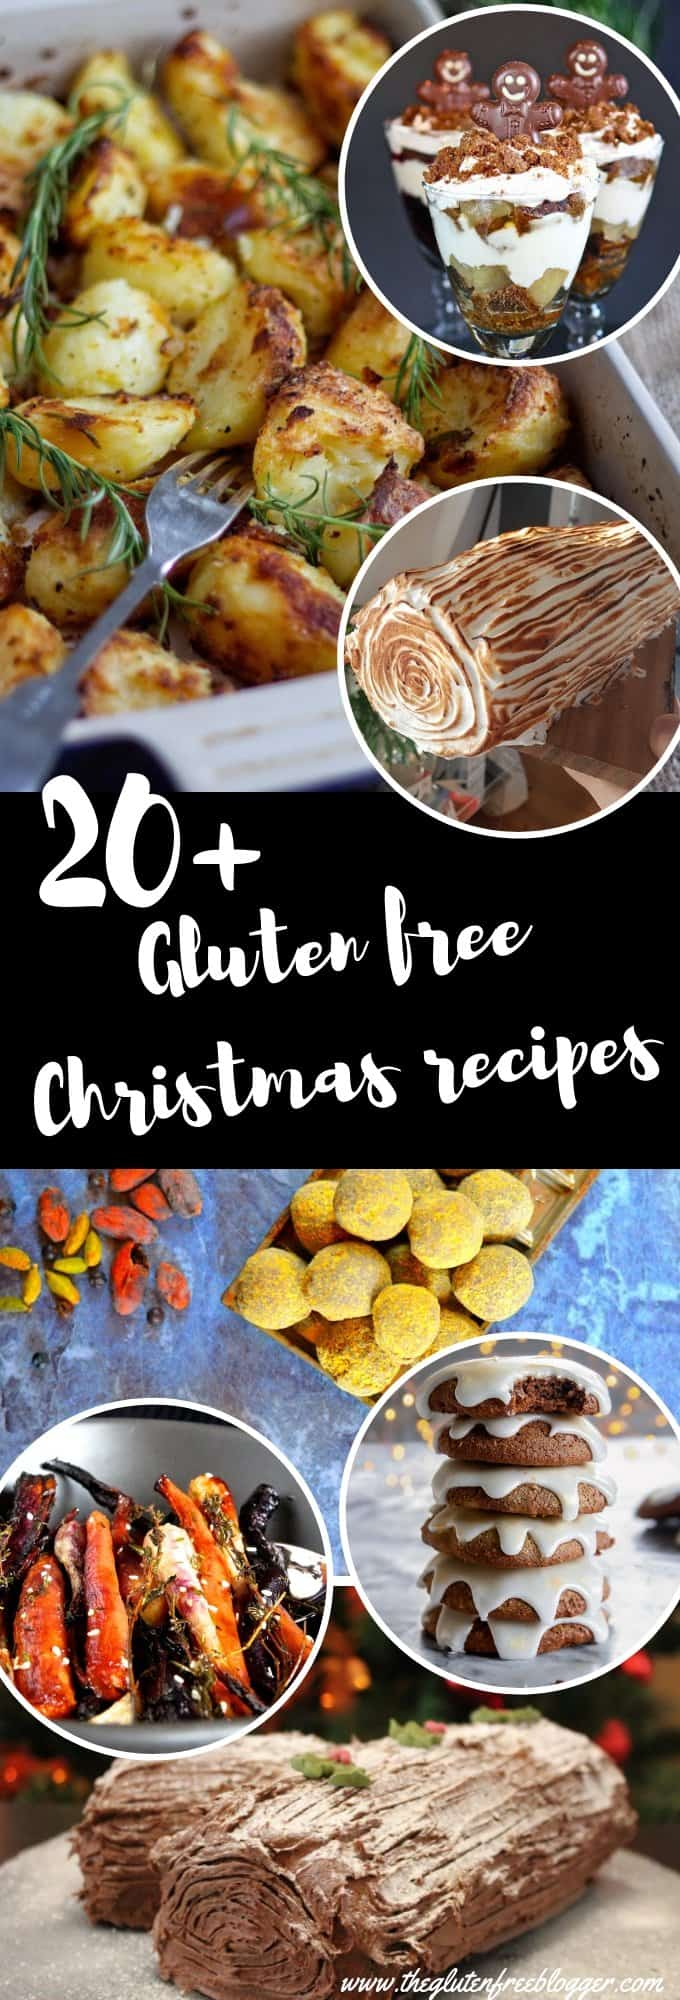 gluten free christmas recipes round-up 20+ christmas dinner dessert gifts recipe